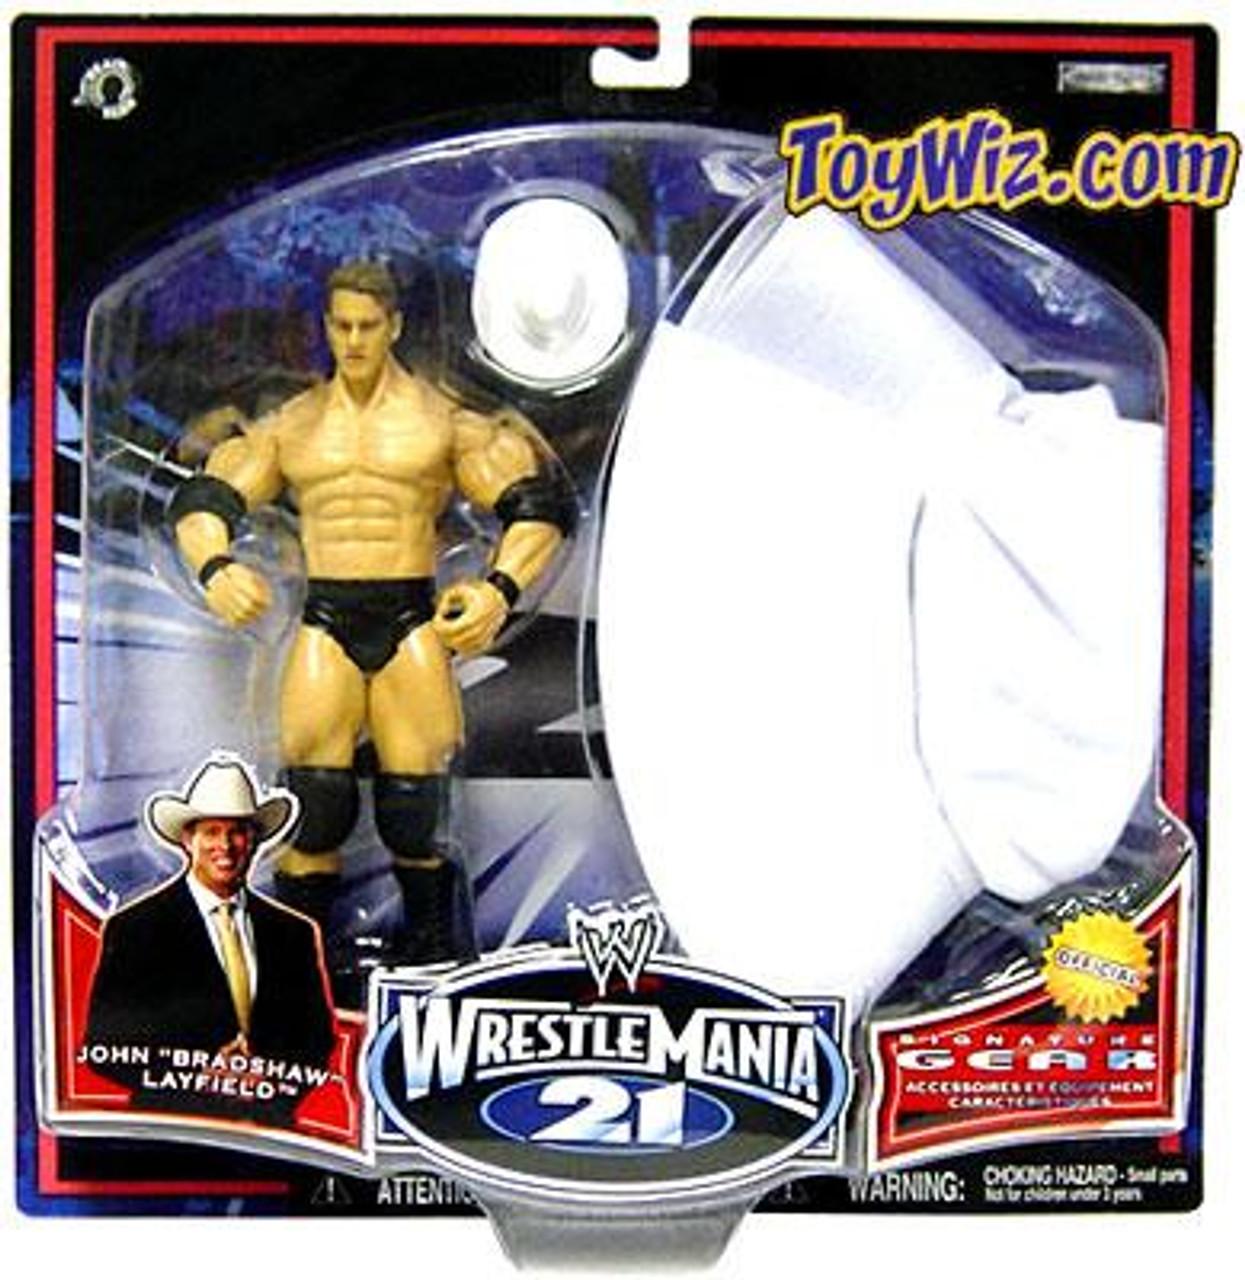 WWE Wrestling WrestleMania 21 Series 2 JBL Exclusive Action Figure